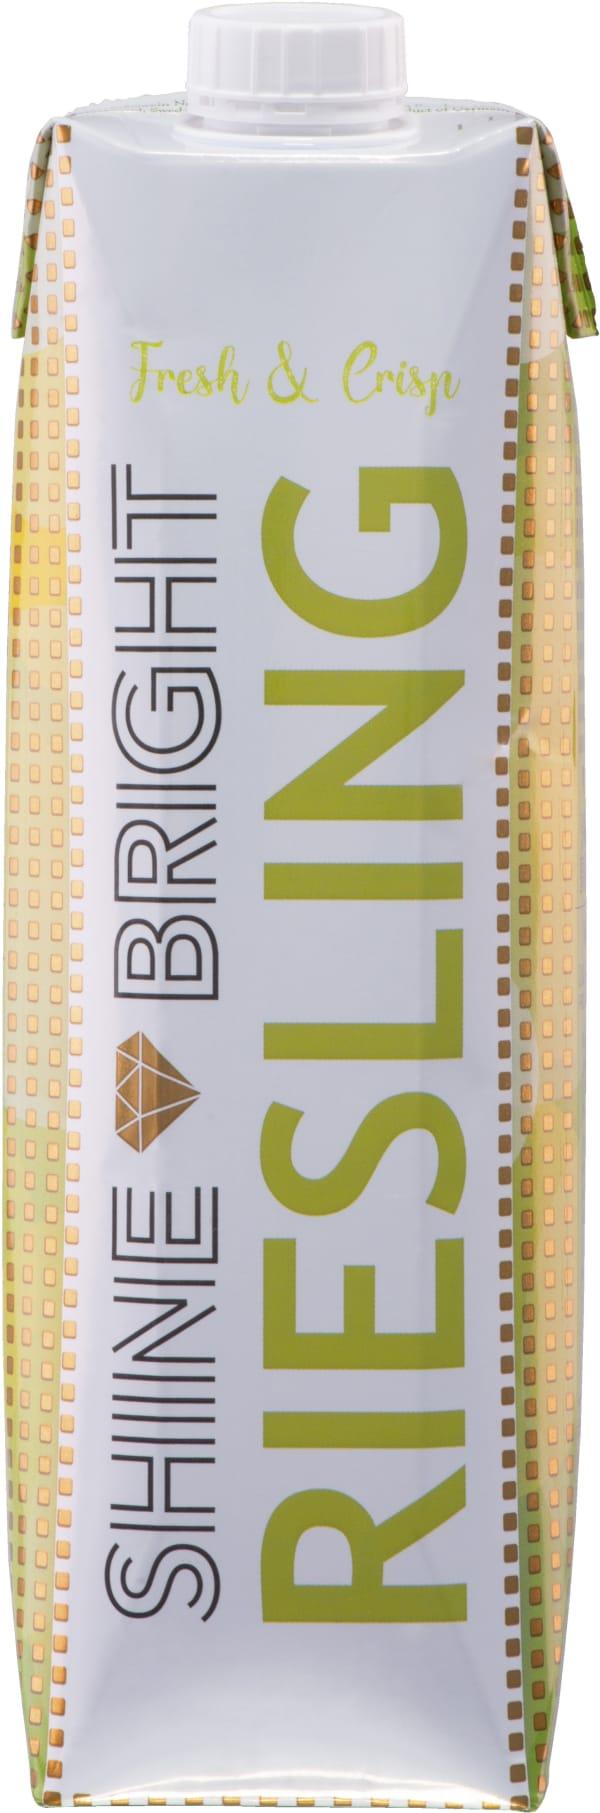 Shine Bright 2019 carton package